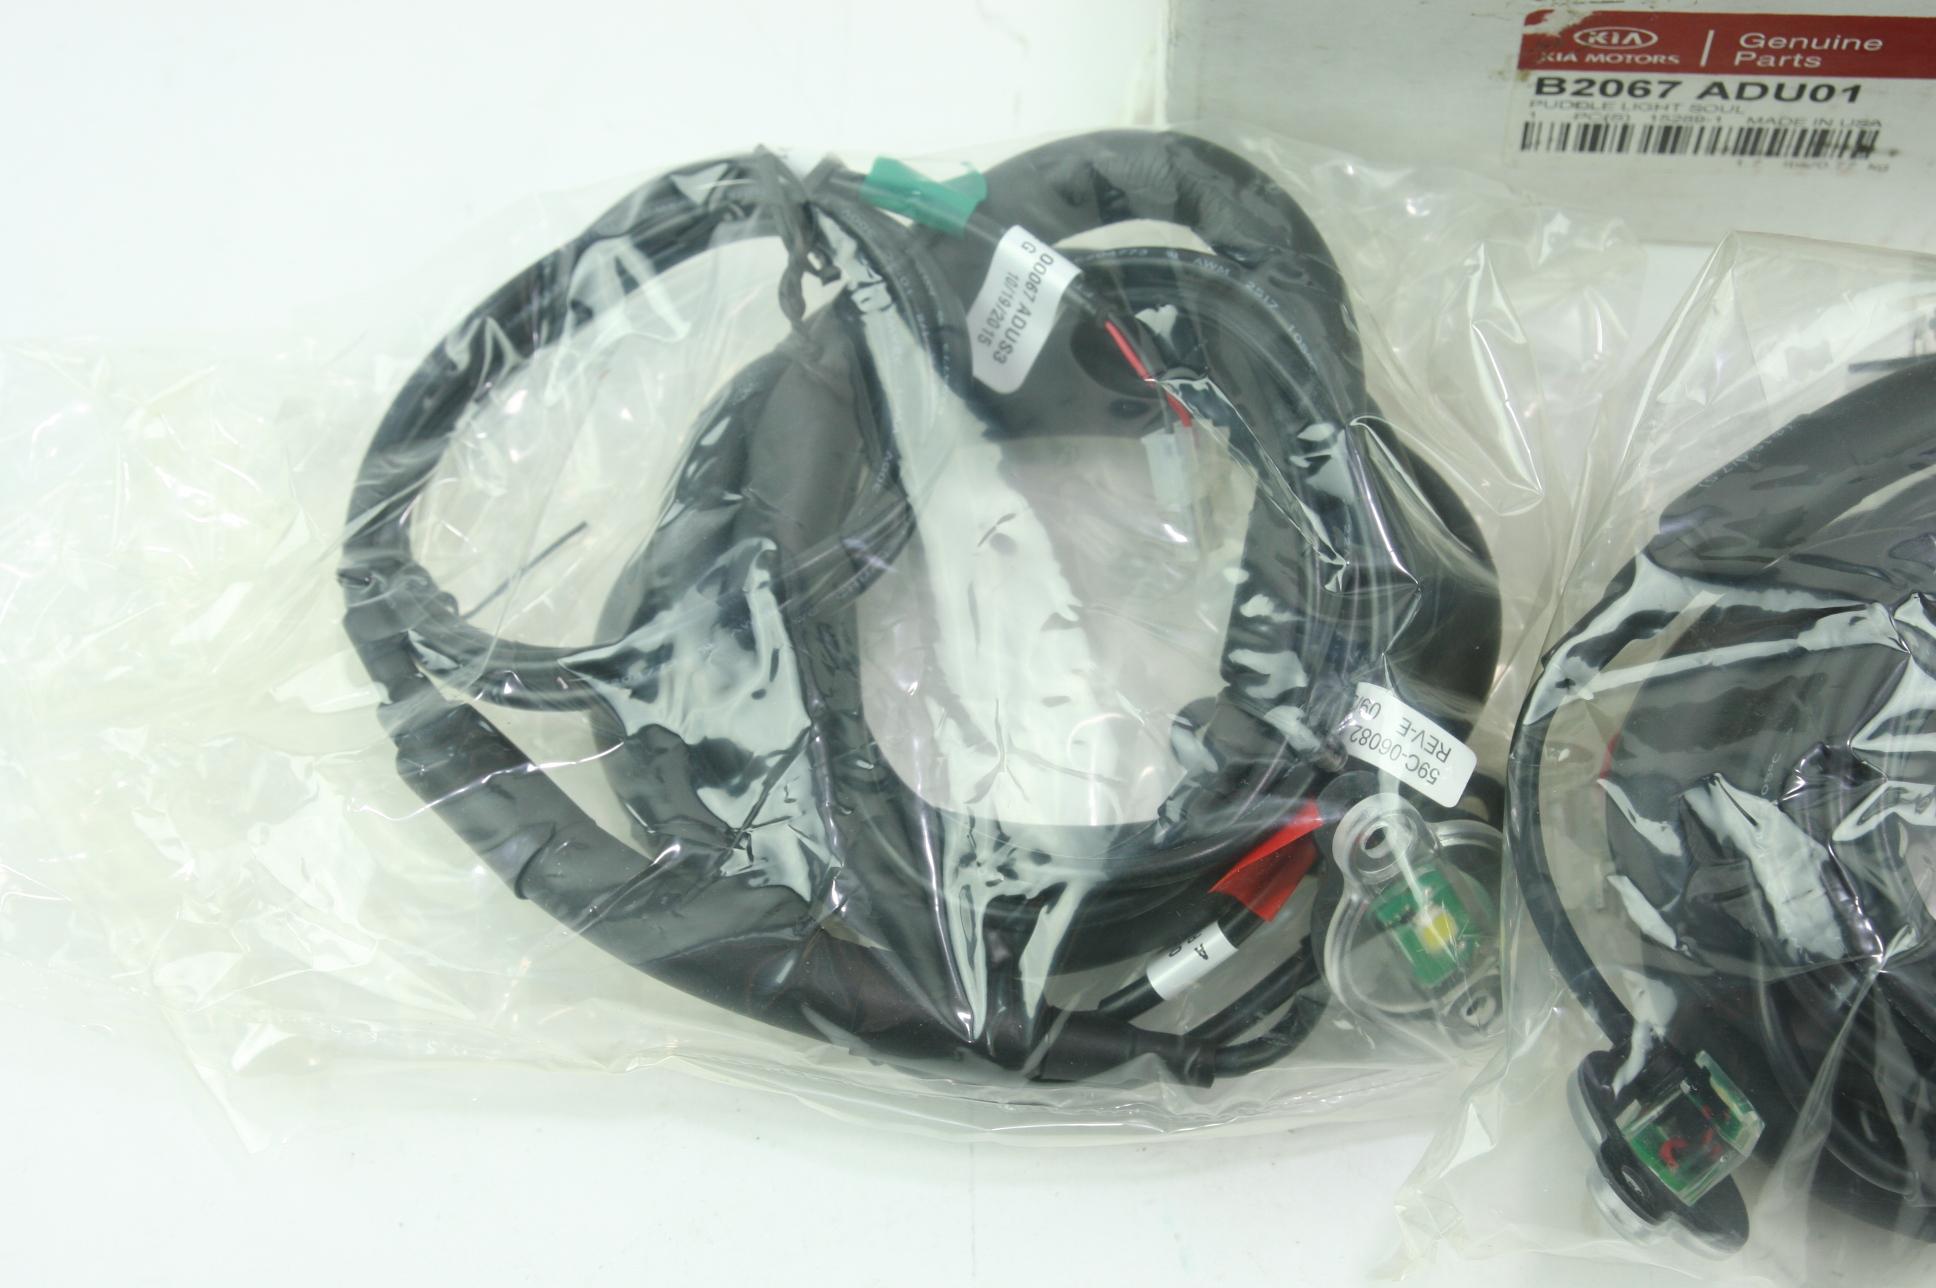 ** Genuine Kia 14-19 Soul Exterior LED Lighting Kit New OEM Packaging B2067ADU01 - image 7